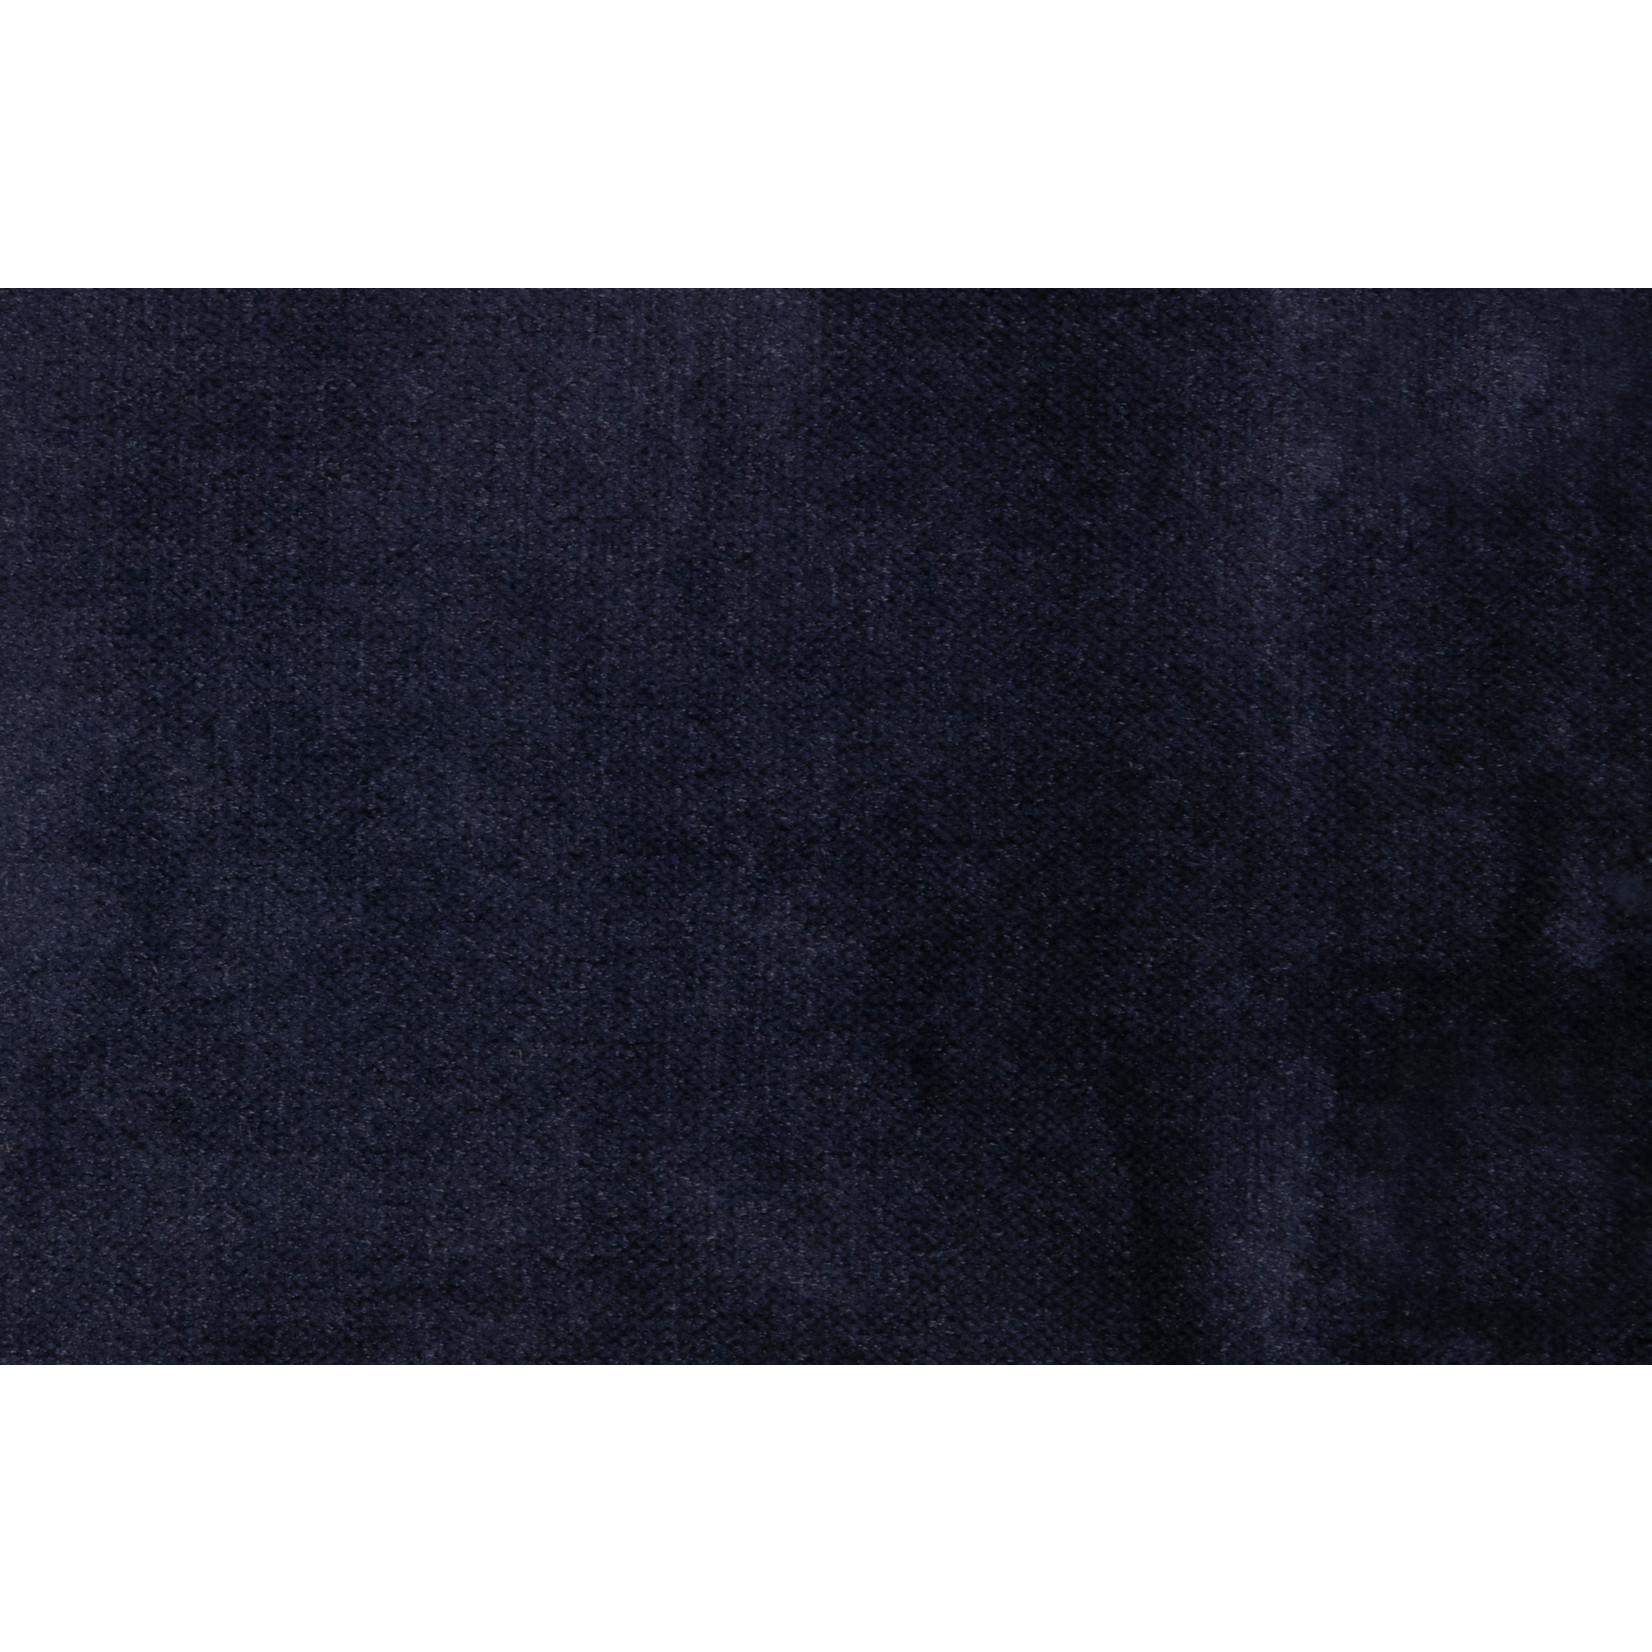 Be Pure Home Rodeo Hoekbank Rechts Velvet Dark Blue Nightshade